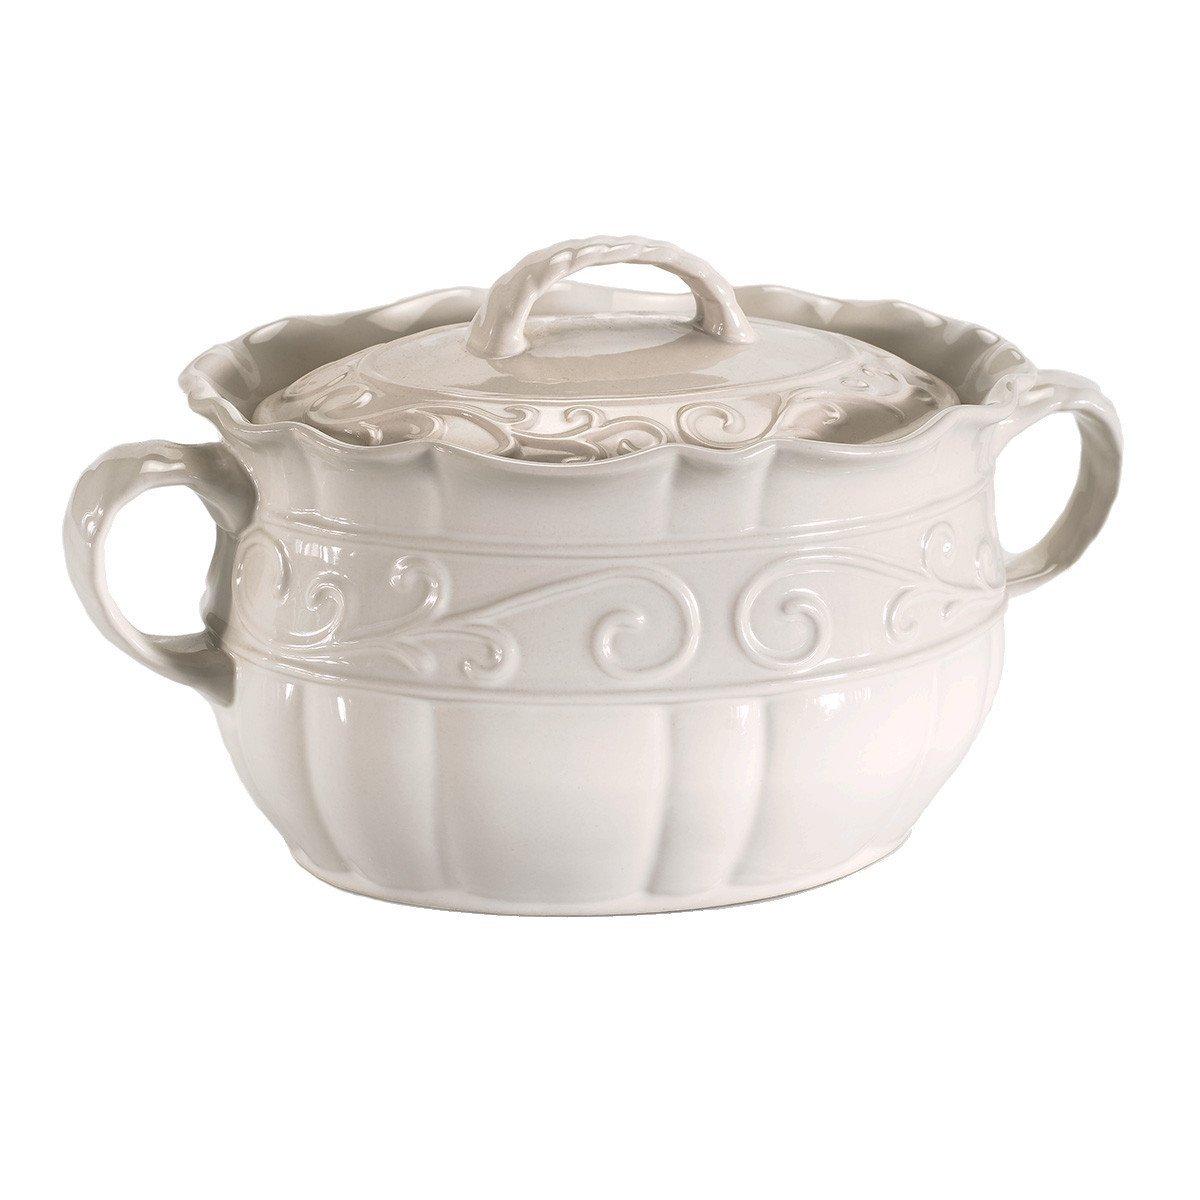 Celebrating Home Veranda Home Bean Pot (Stoneware Casserole Dish) - Oven, Microwave & Dishwasher Safe